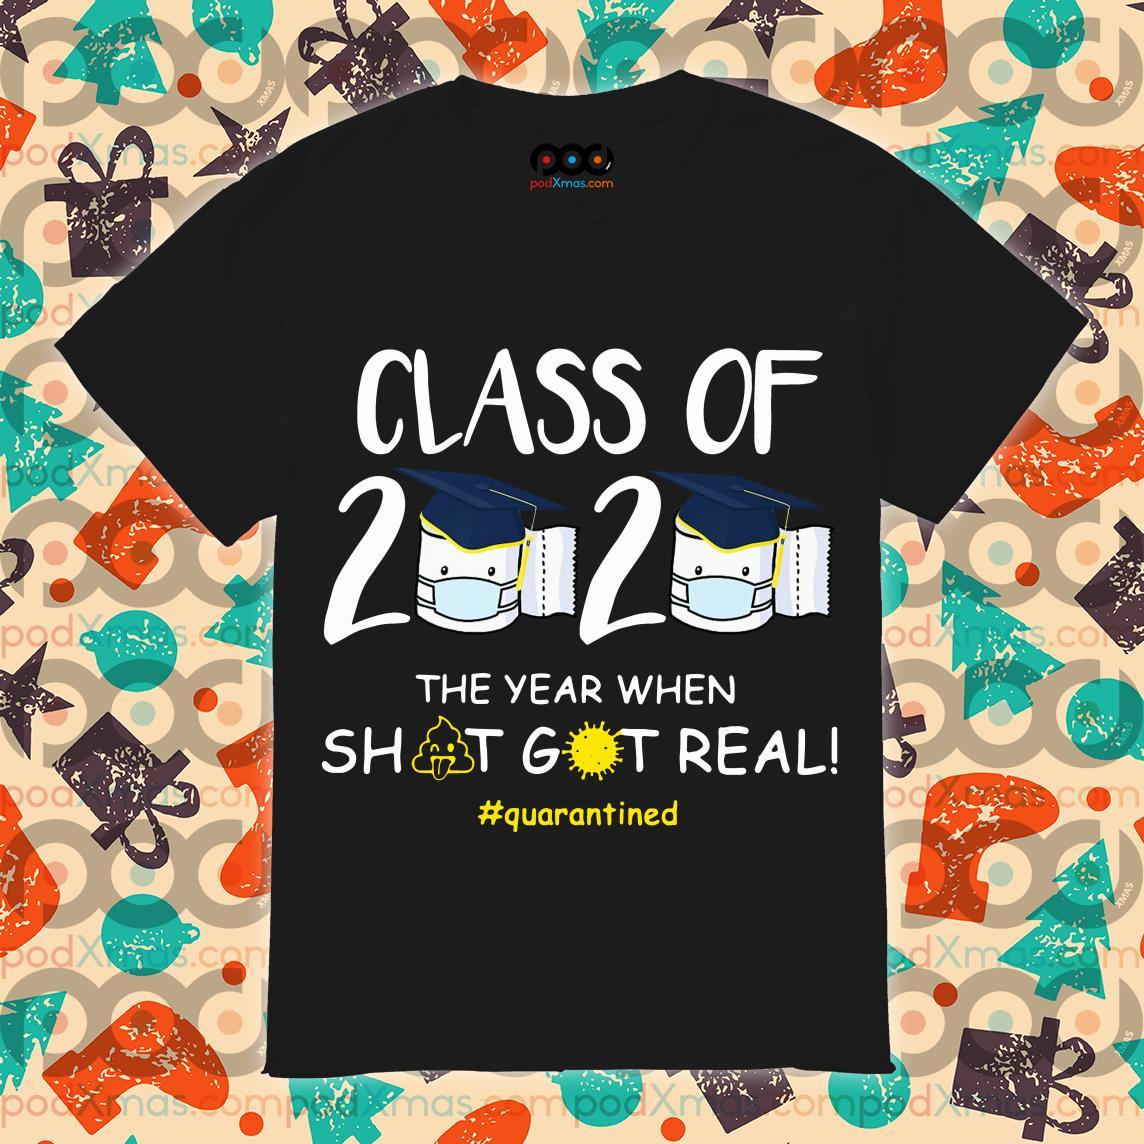 Class of 2020 shit got real quarantined T-shirt